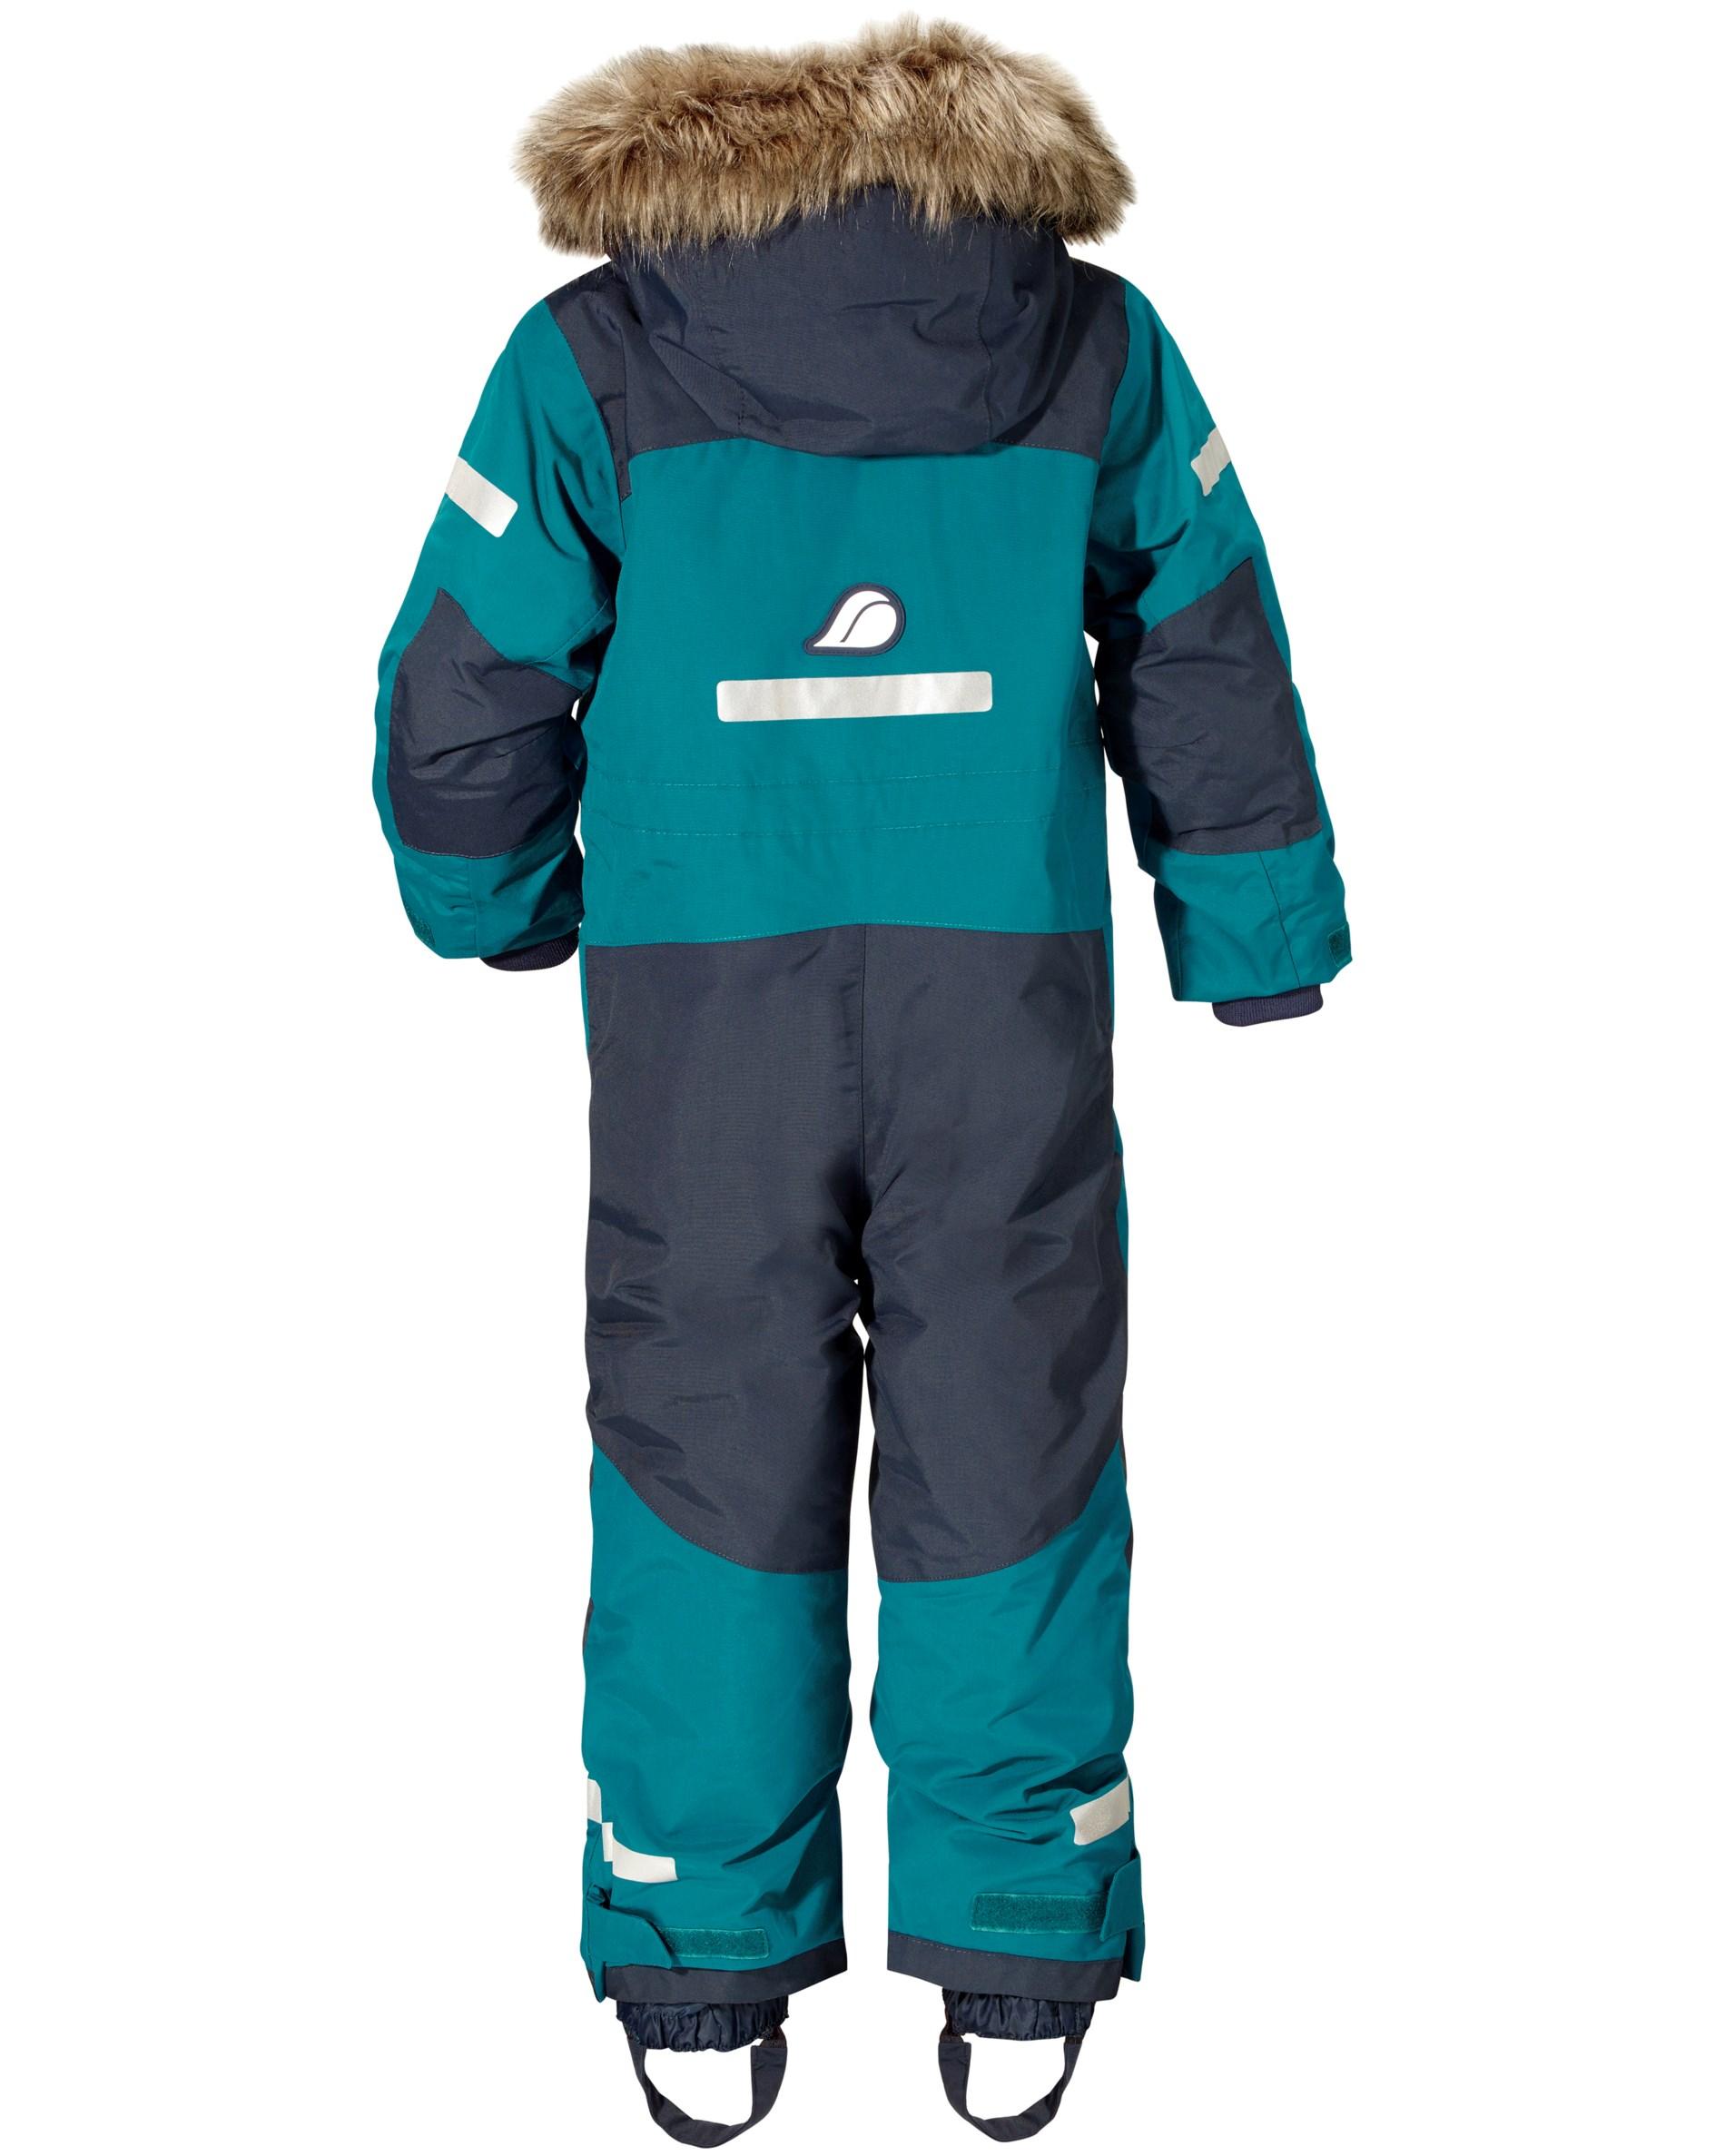 c014ff3bc0a Björnen Kids Coverall Glacier Blue